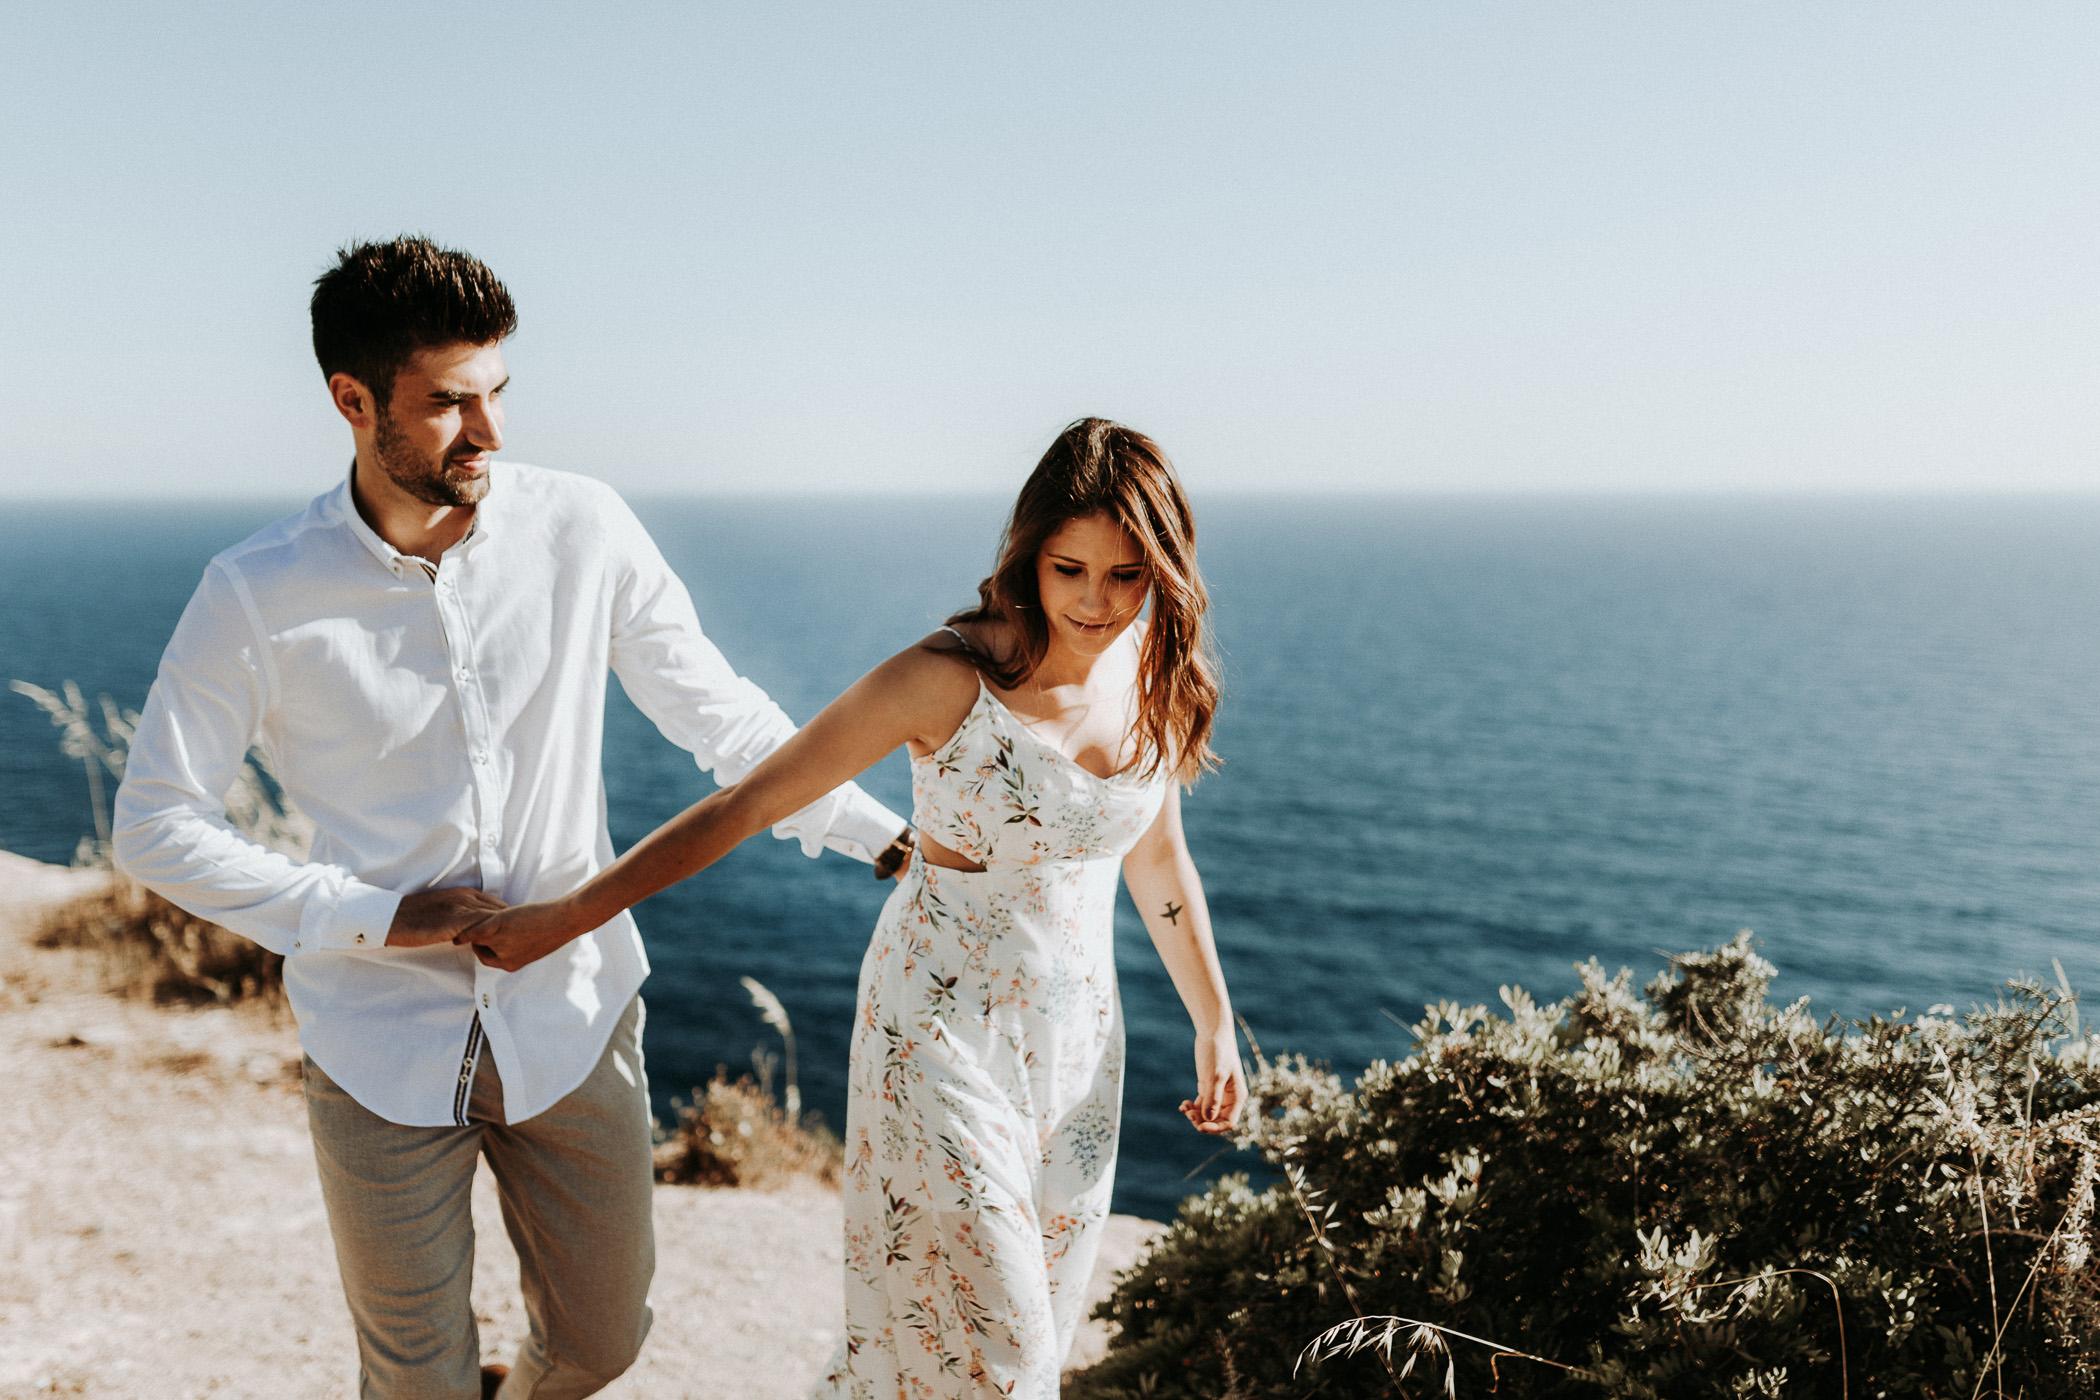 DanielaMarquardtPhotography_wedding_elopement_mallorca_spain_calapi_palma_lauraandtoni_27